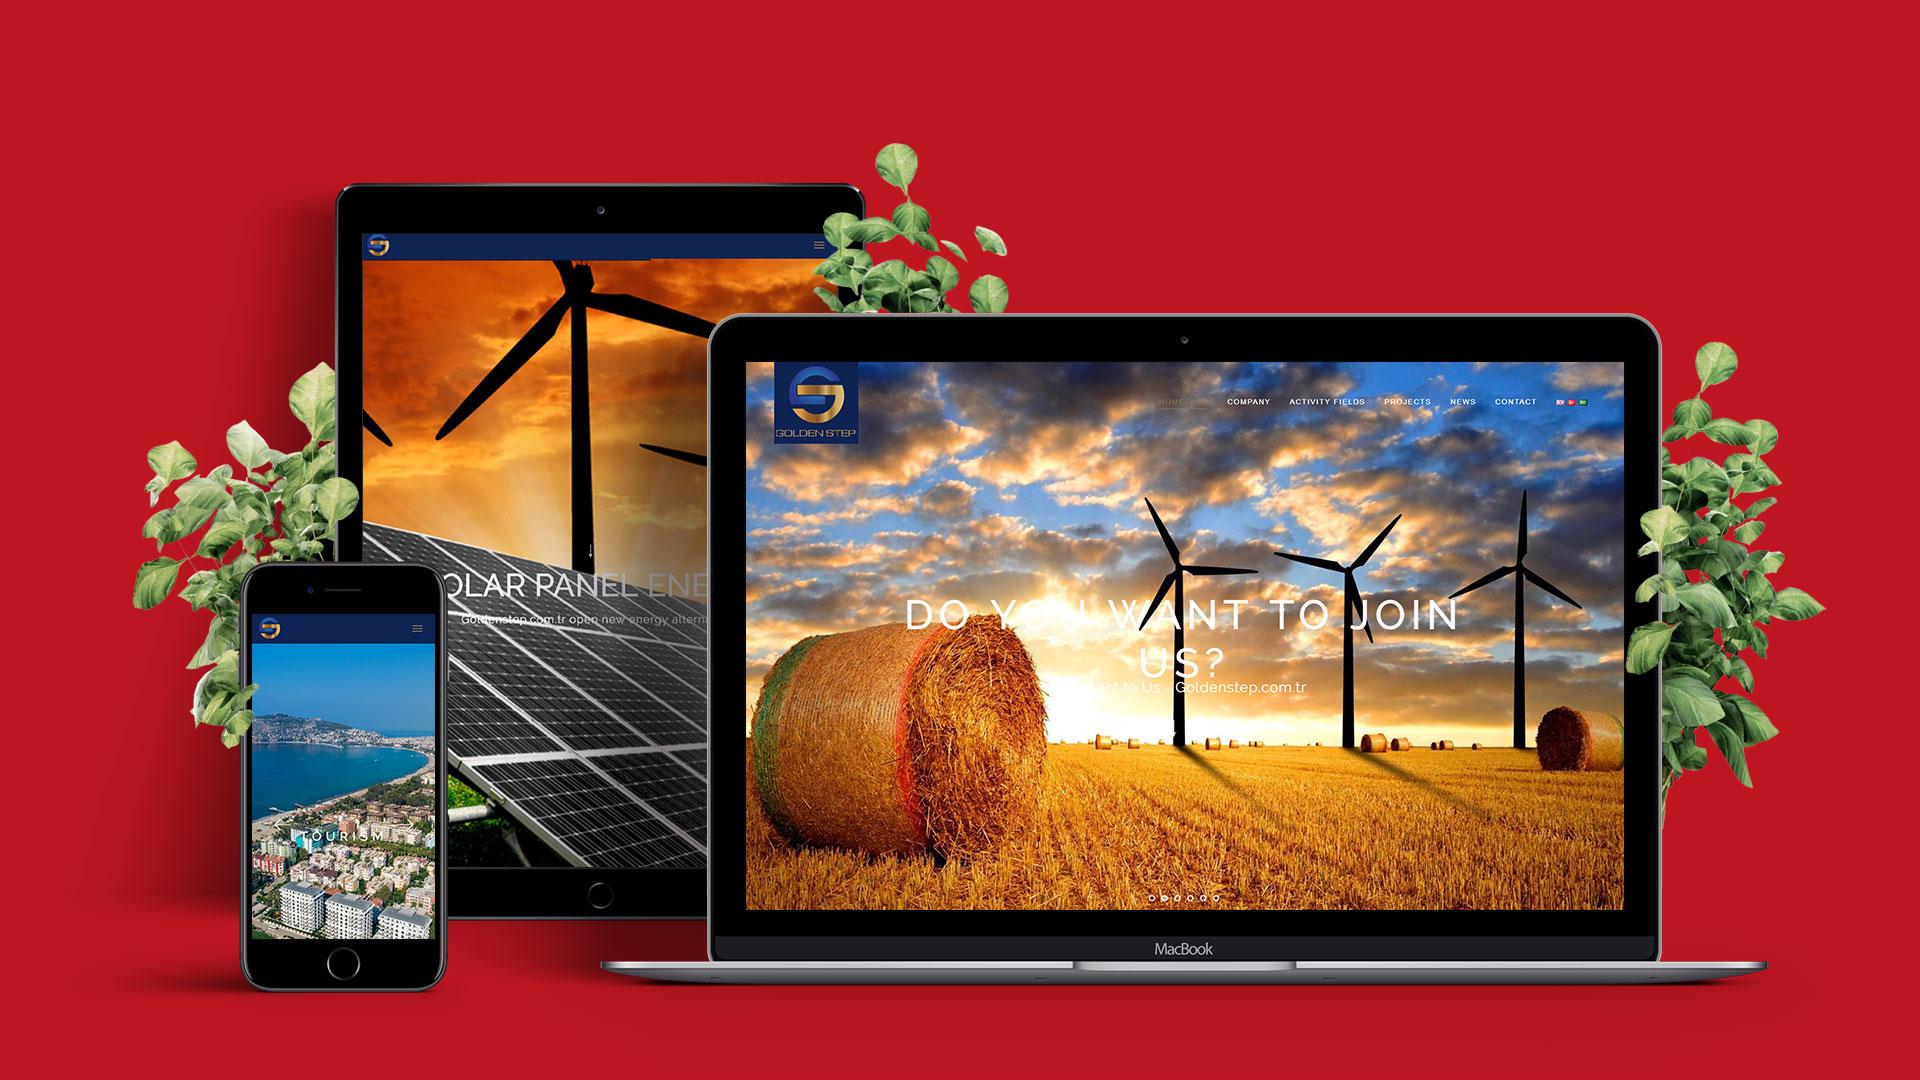 webfili-goldenstep-enerji-tarım-Turizm-Alanya-01 jpg